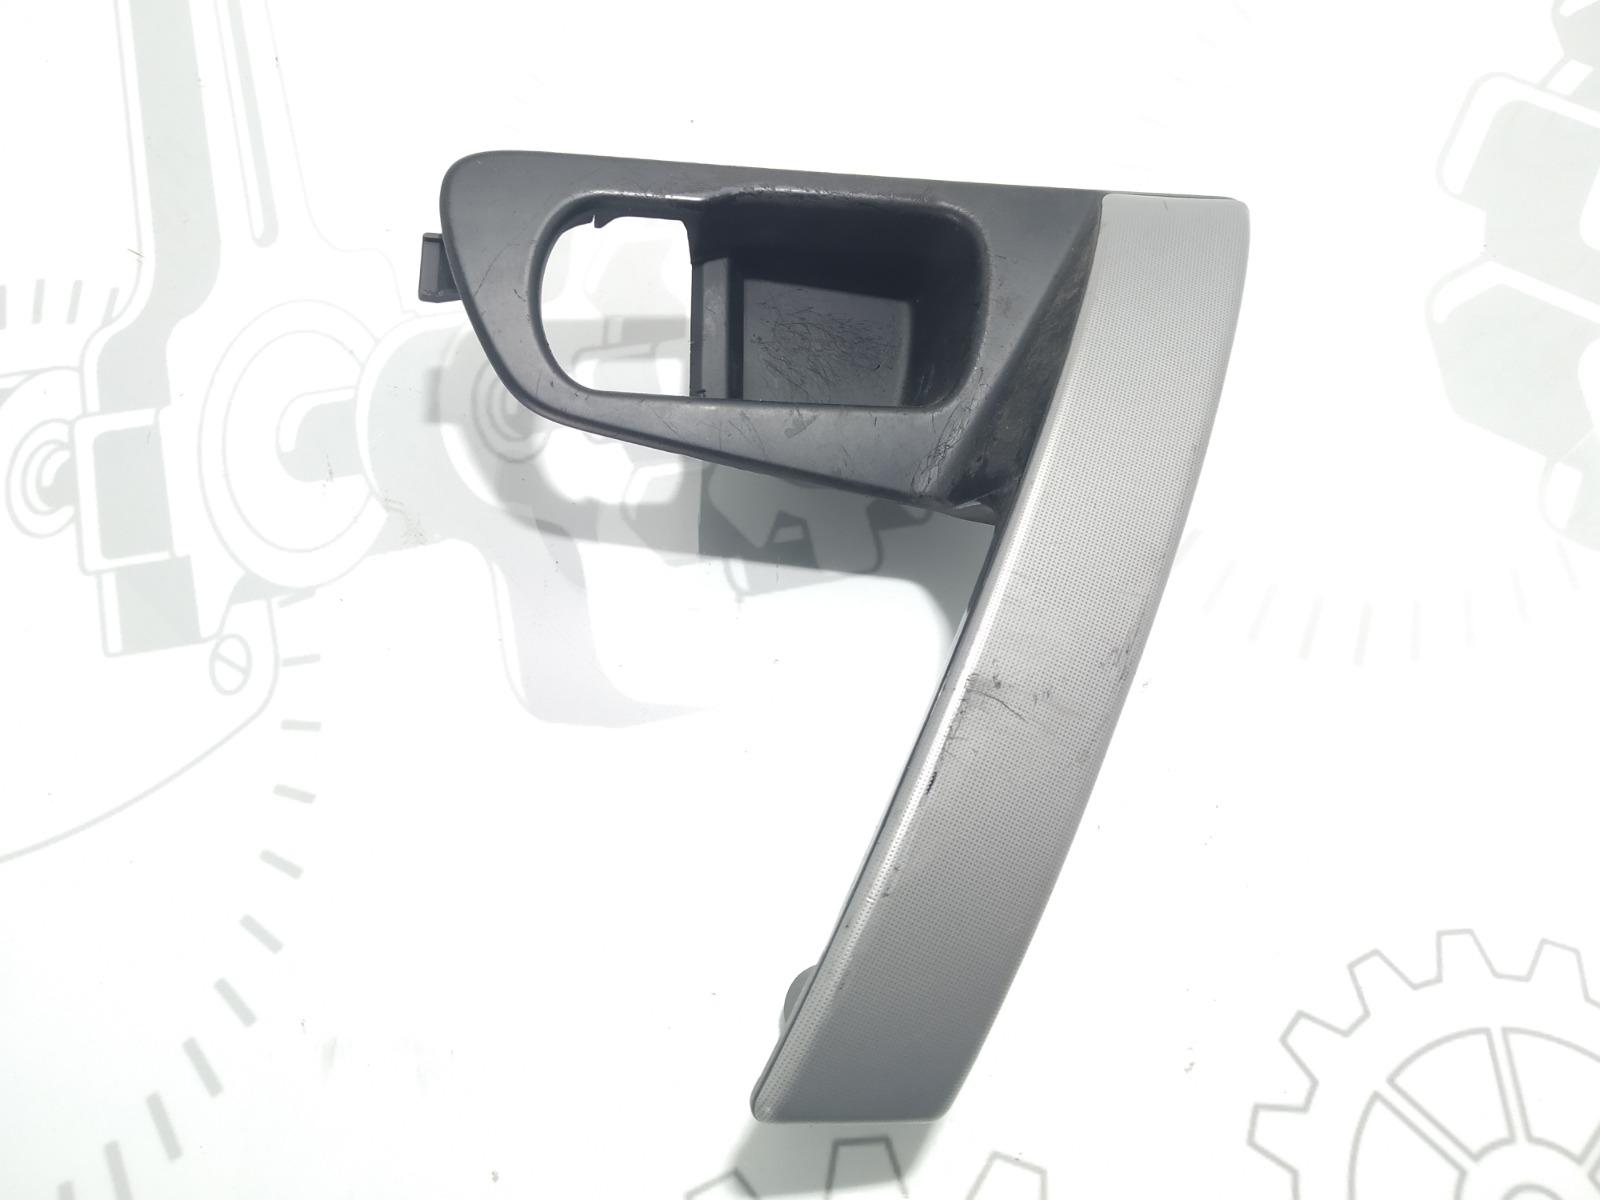 Ручка внутренняя передняя левая Nissan Qashqai 1.5 DCI 2007 (б/у)